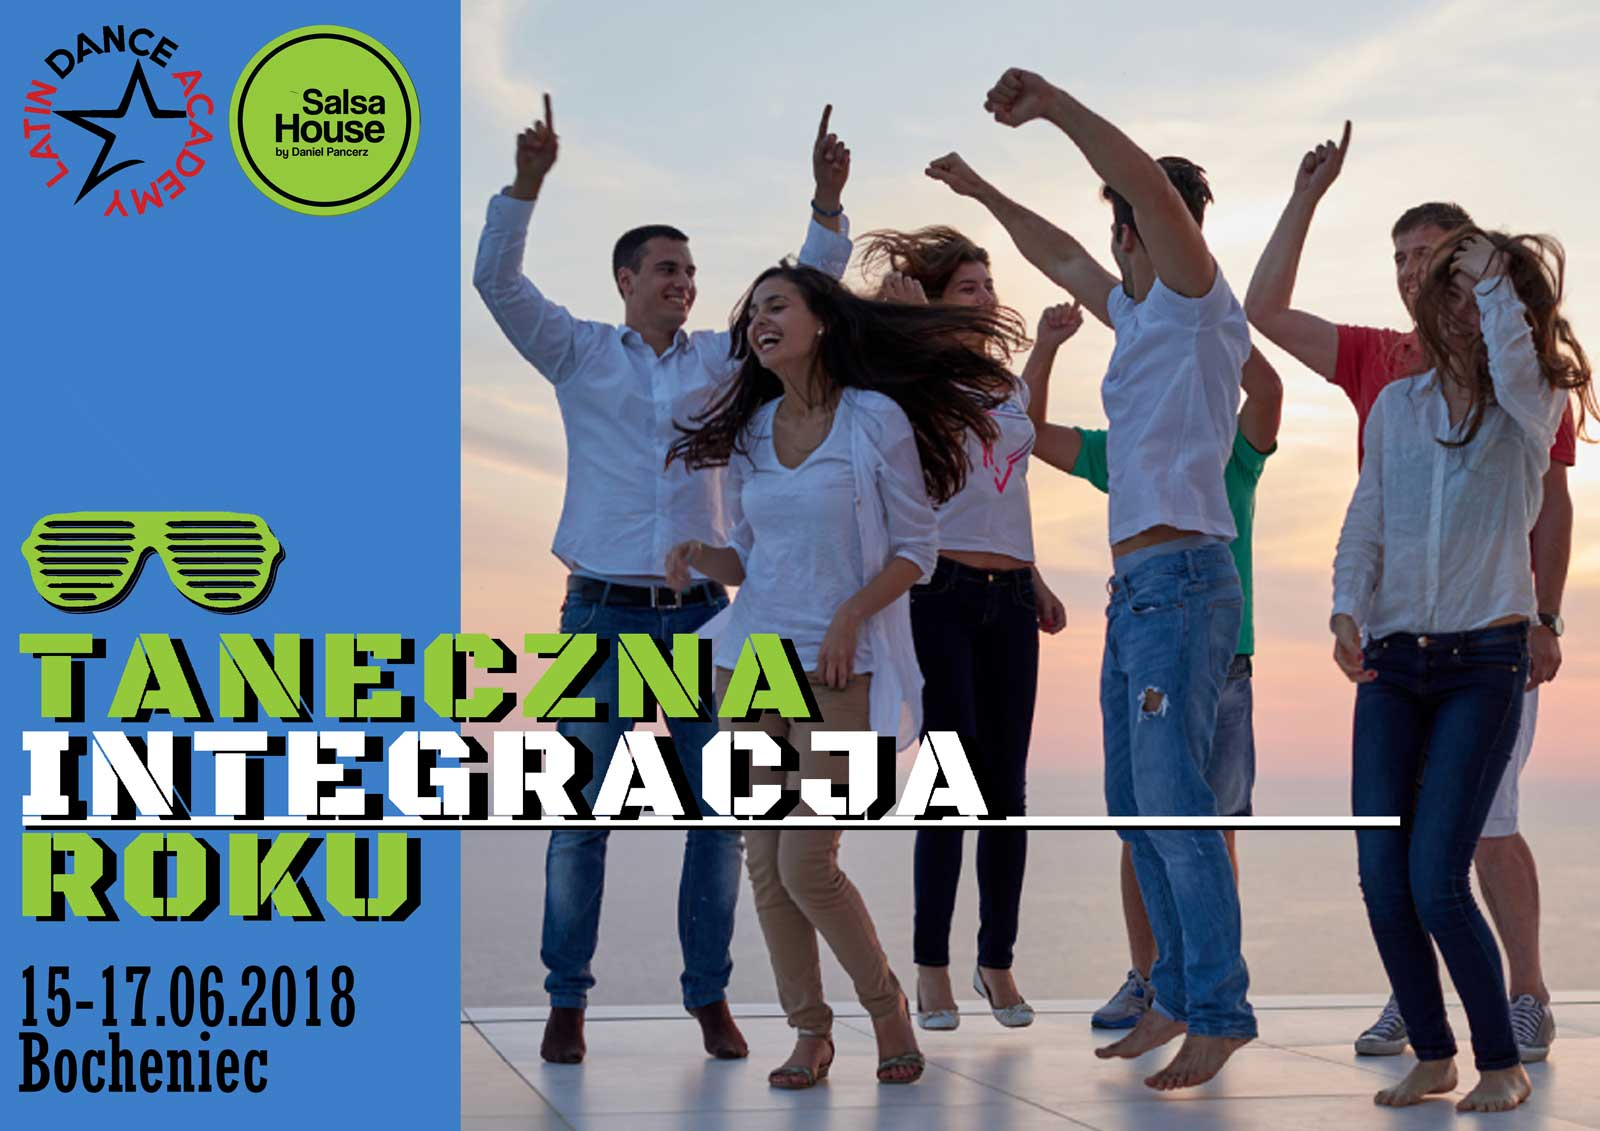 taneczna-integracja-roku-2018-salsa-house